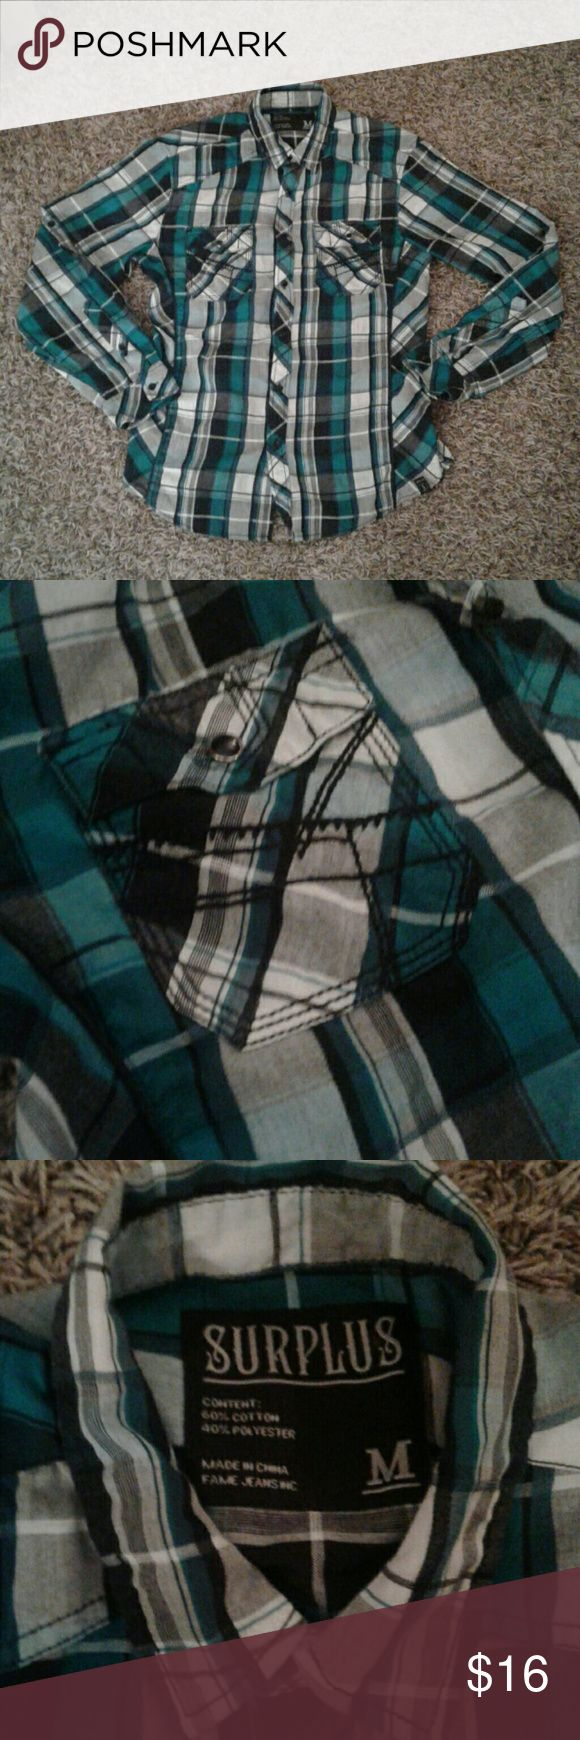 Mens plaid shirt, like new, medium Excellent condition Surplus Shirts Dress Shirts